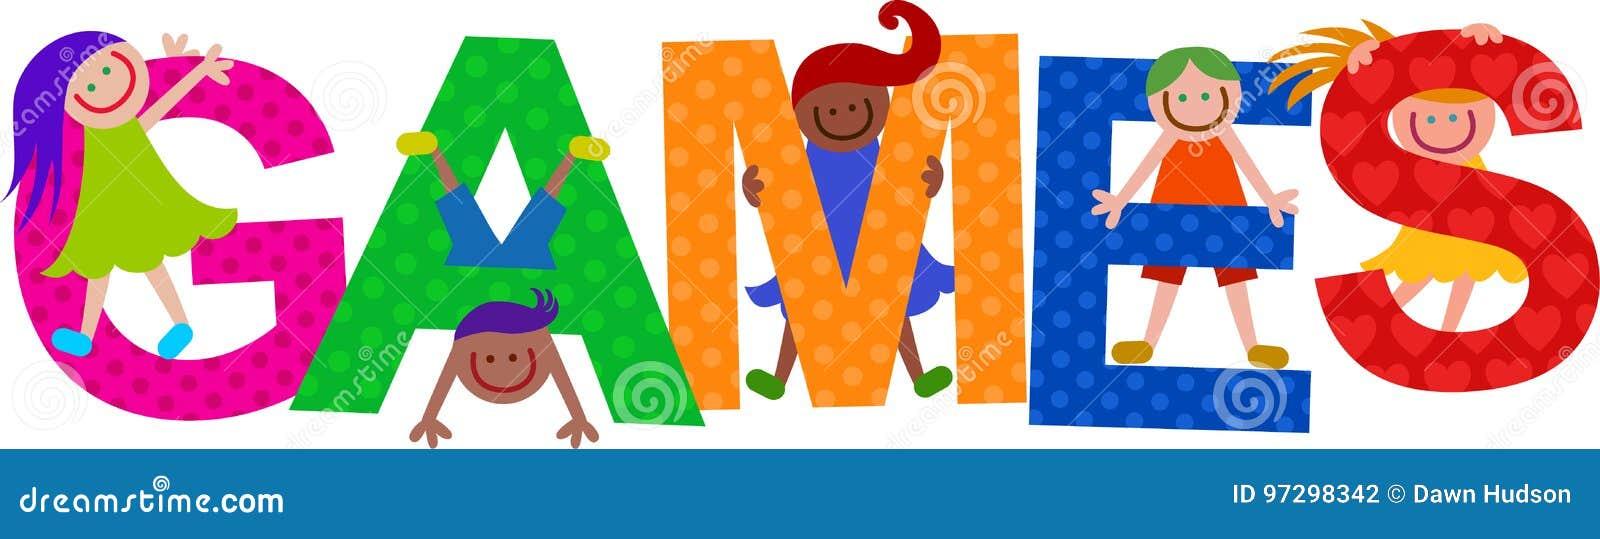 Games Kids Title Text Stock Illustration Illustration Of Preschool 97298342